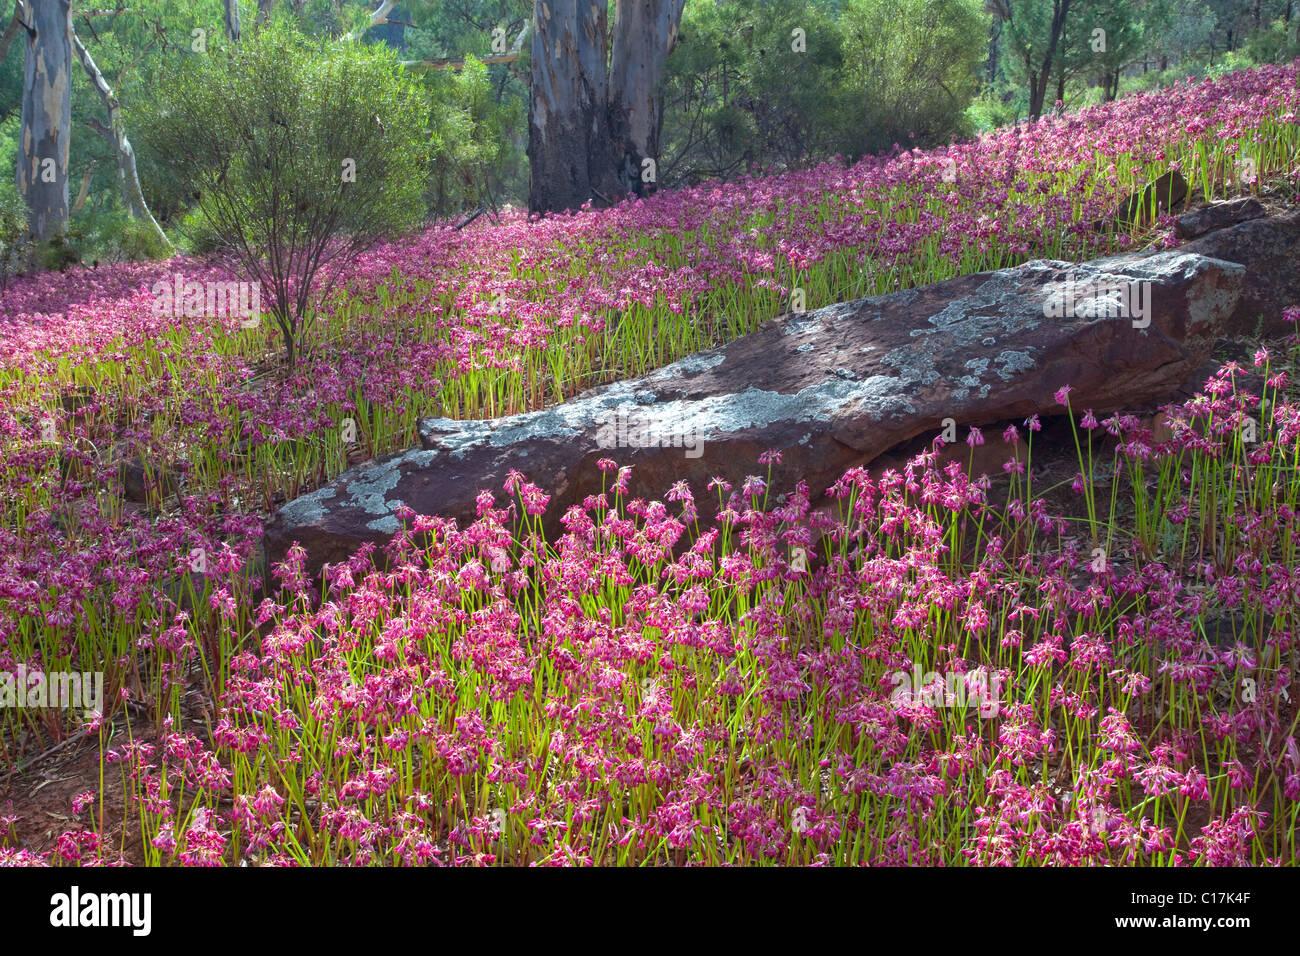 Garland lirios (Calostemma purpureum), rangos Flinder National Park, South Australia, Australia Foto de stock